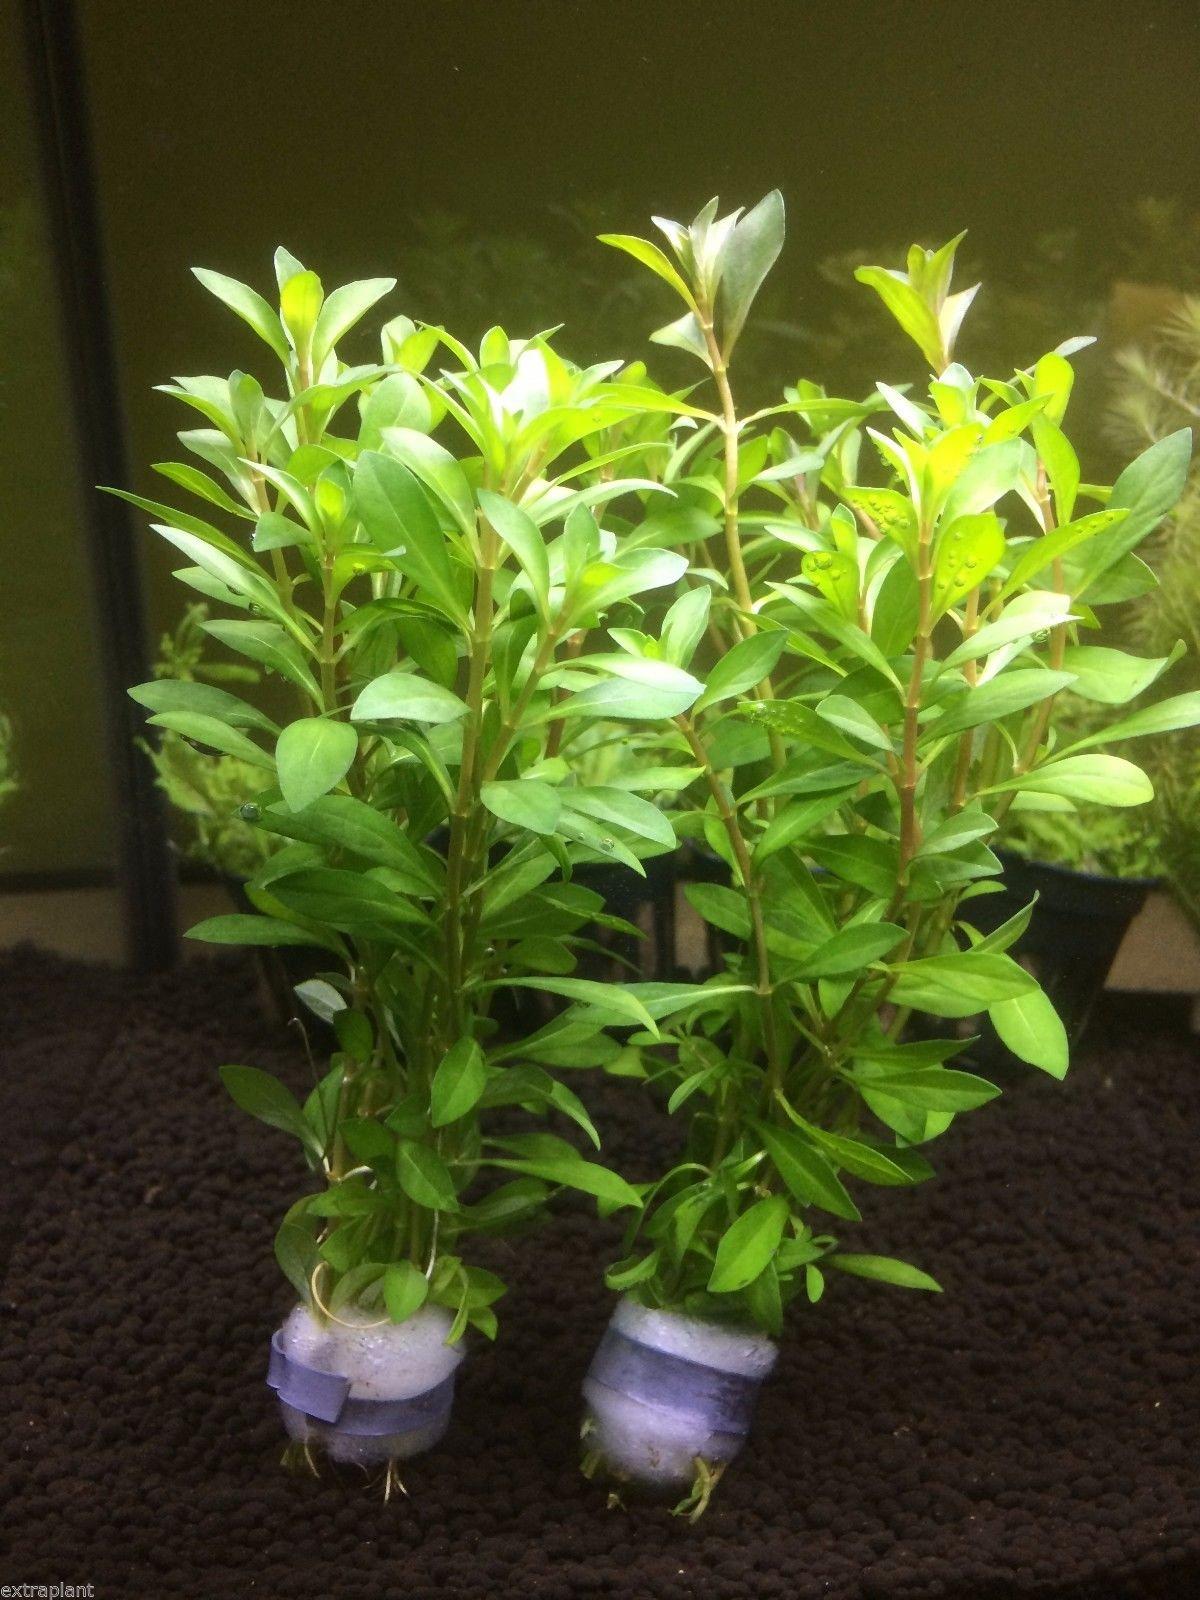 3X Ludwigia Arcuata Bunch Repens Needle Leaf Live Aquarium Plants BUY2GET1FREE